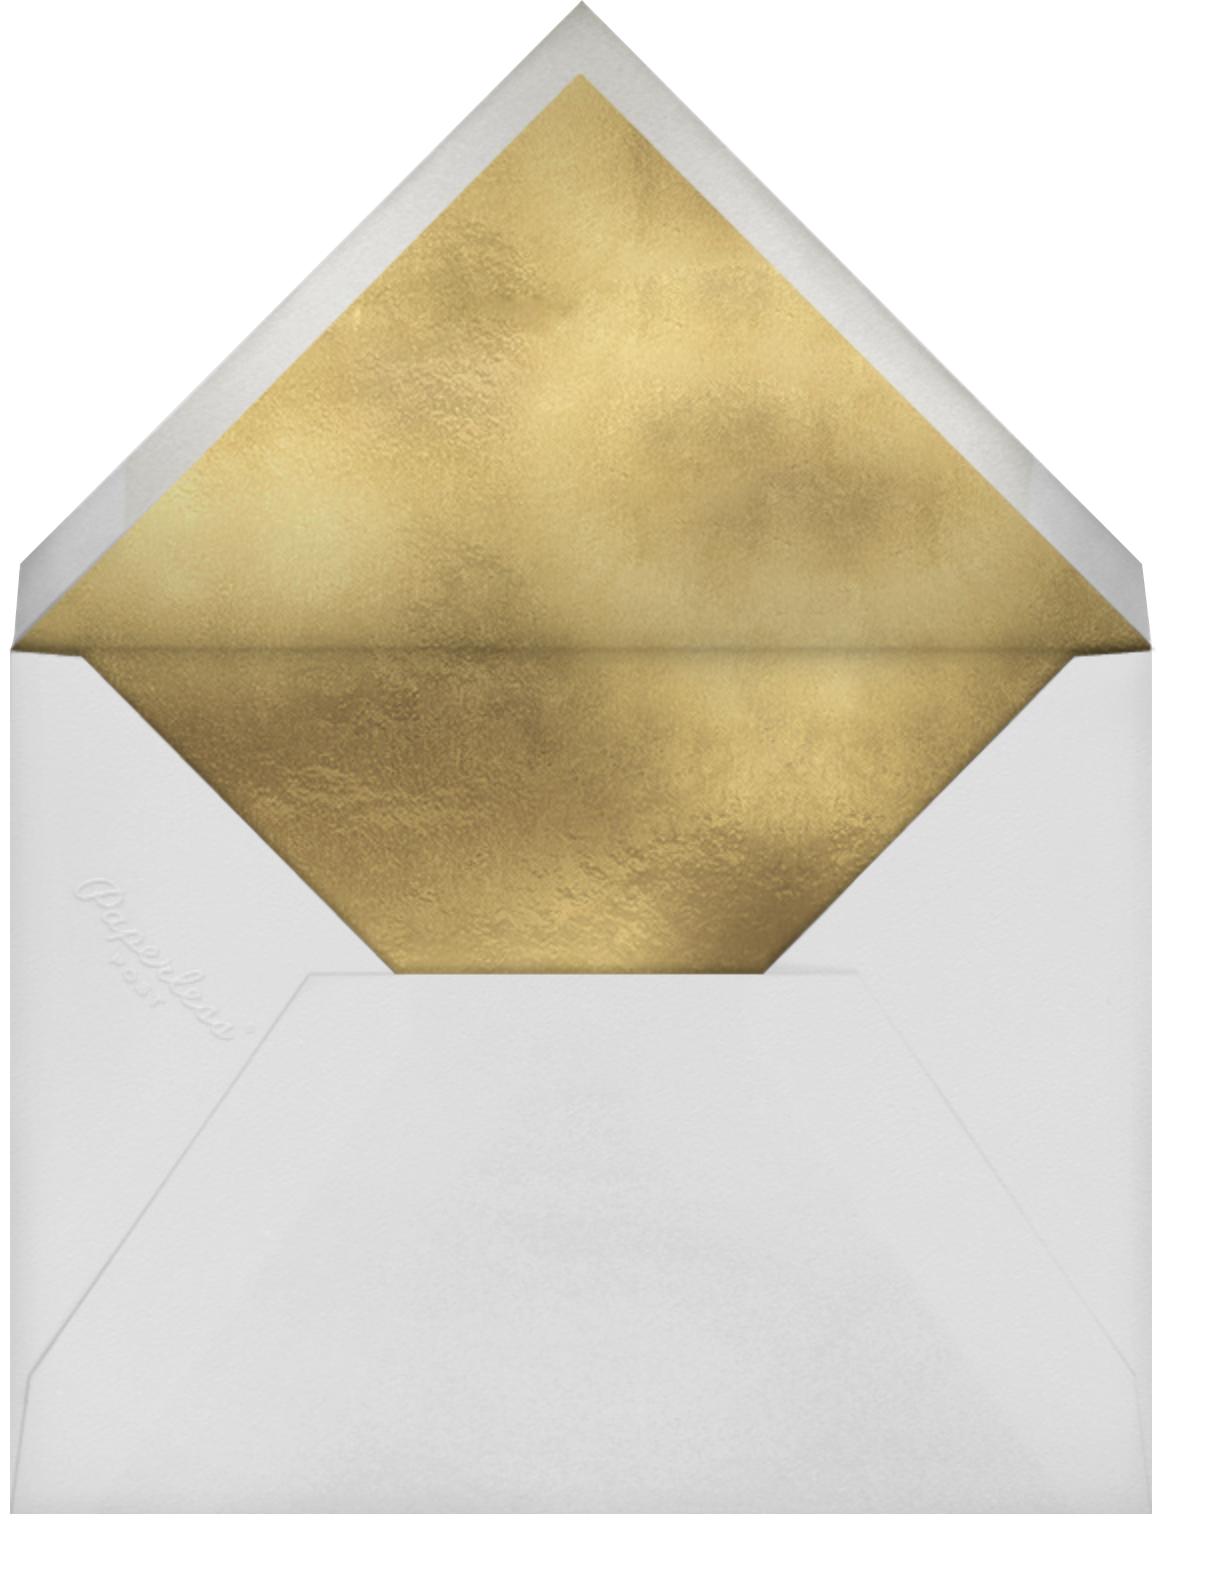 Russian Caravan - Blush - Rifle Paper Co. - Bridal shower - envelope back